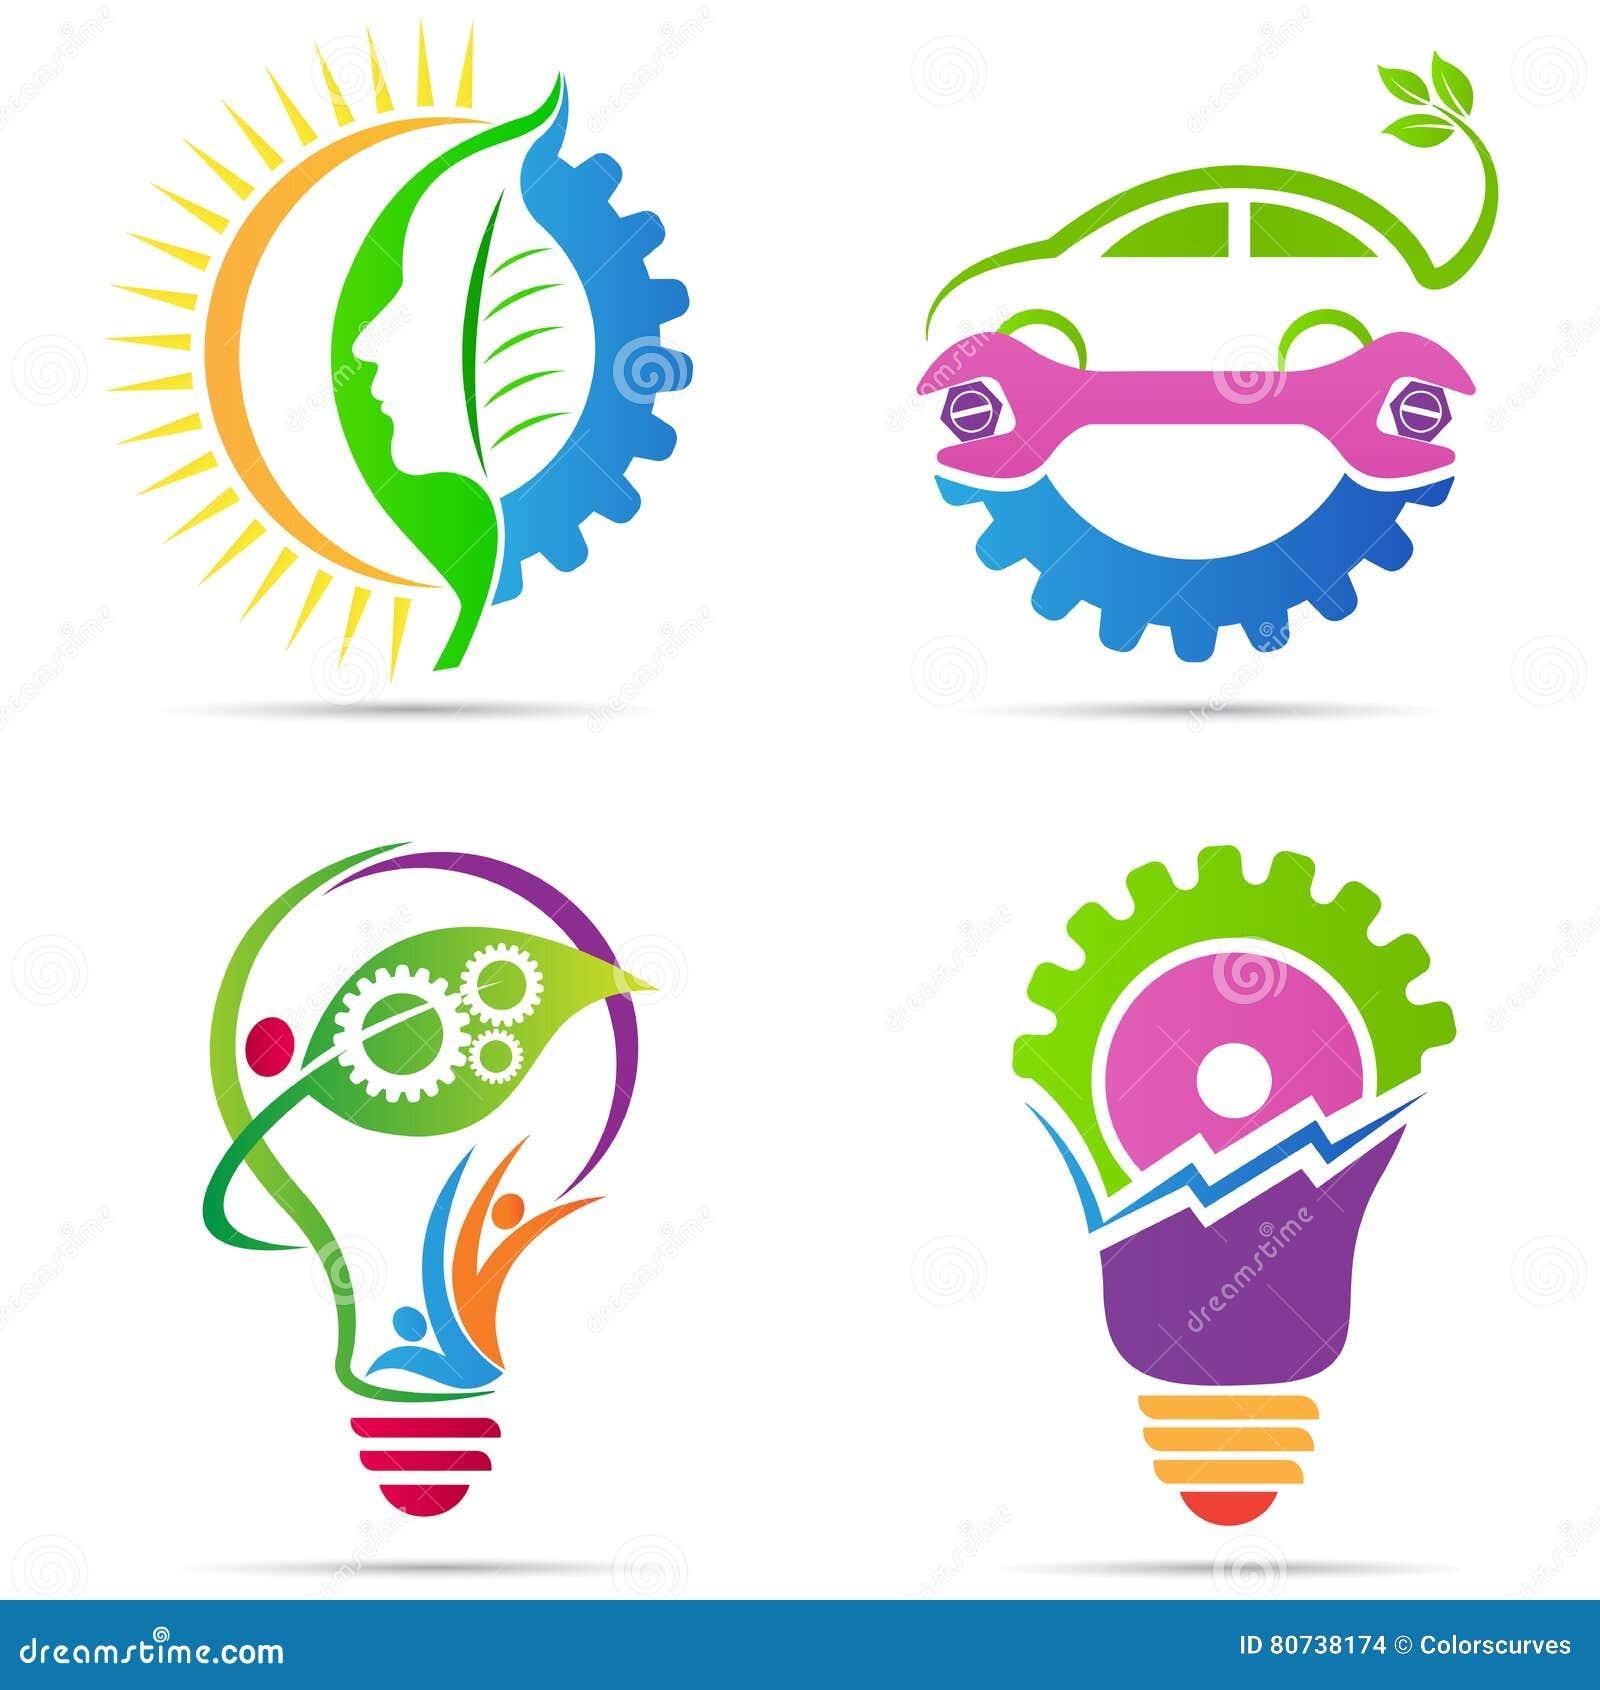 Eco green energy gear